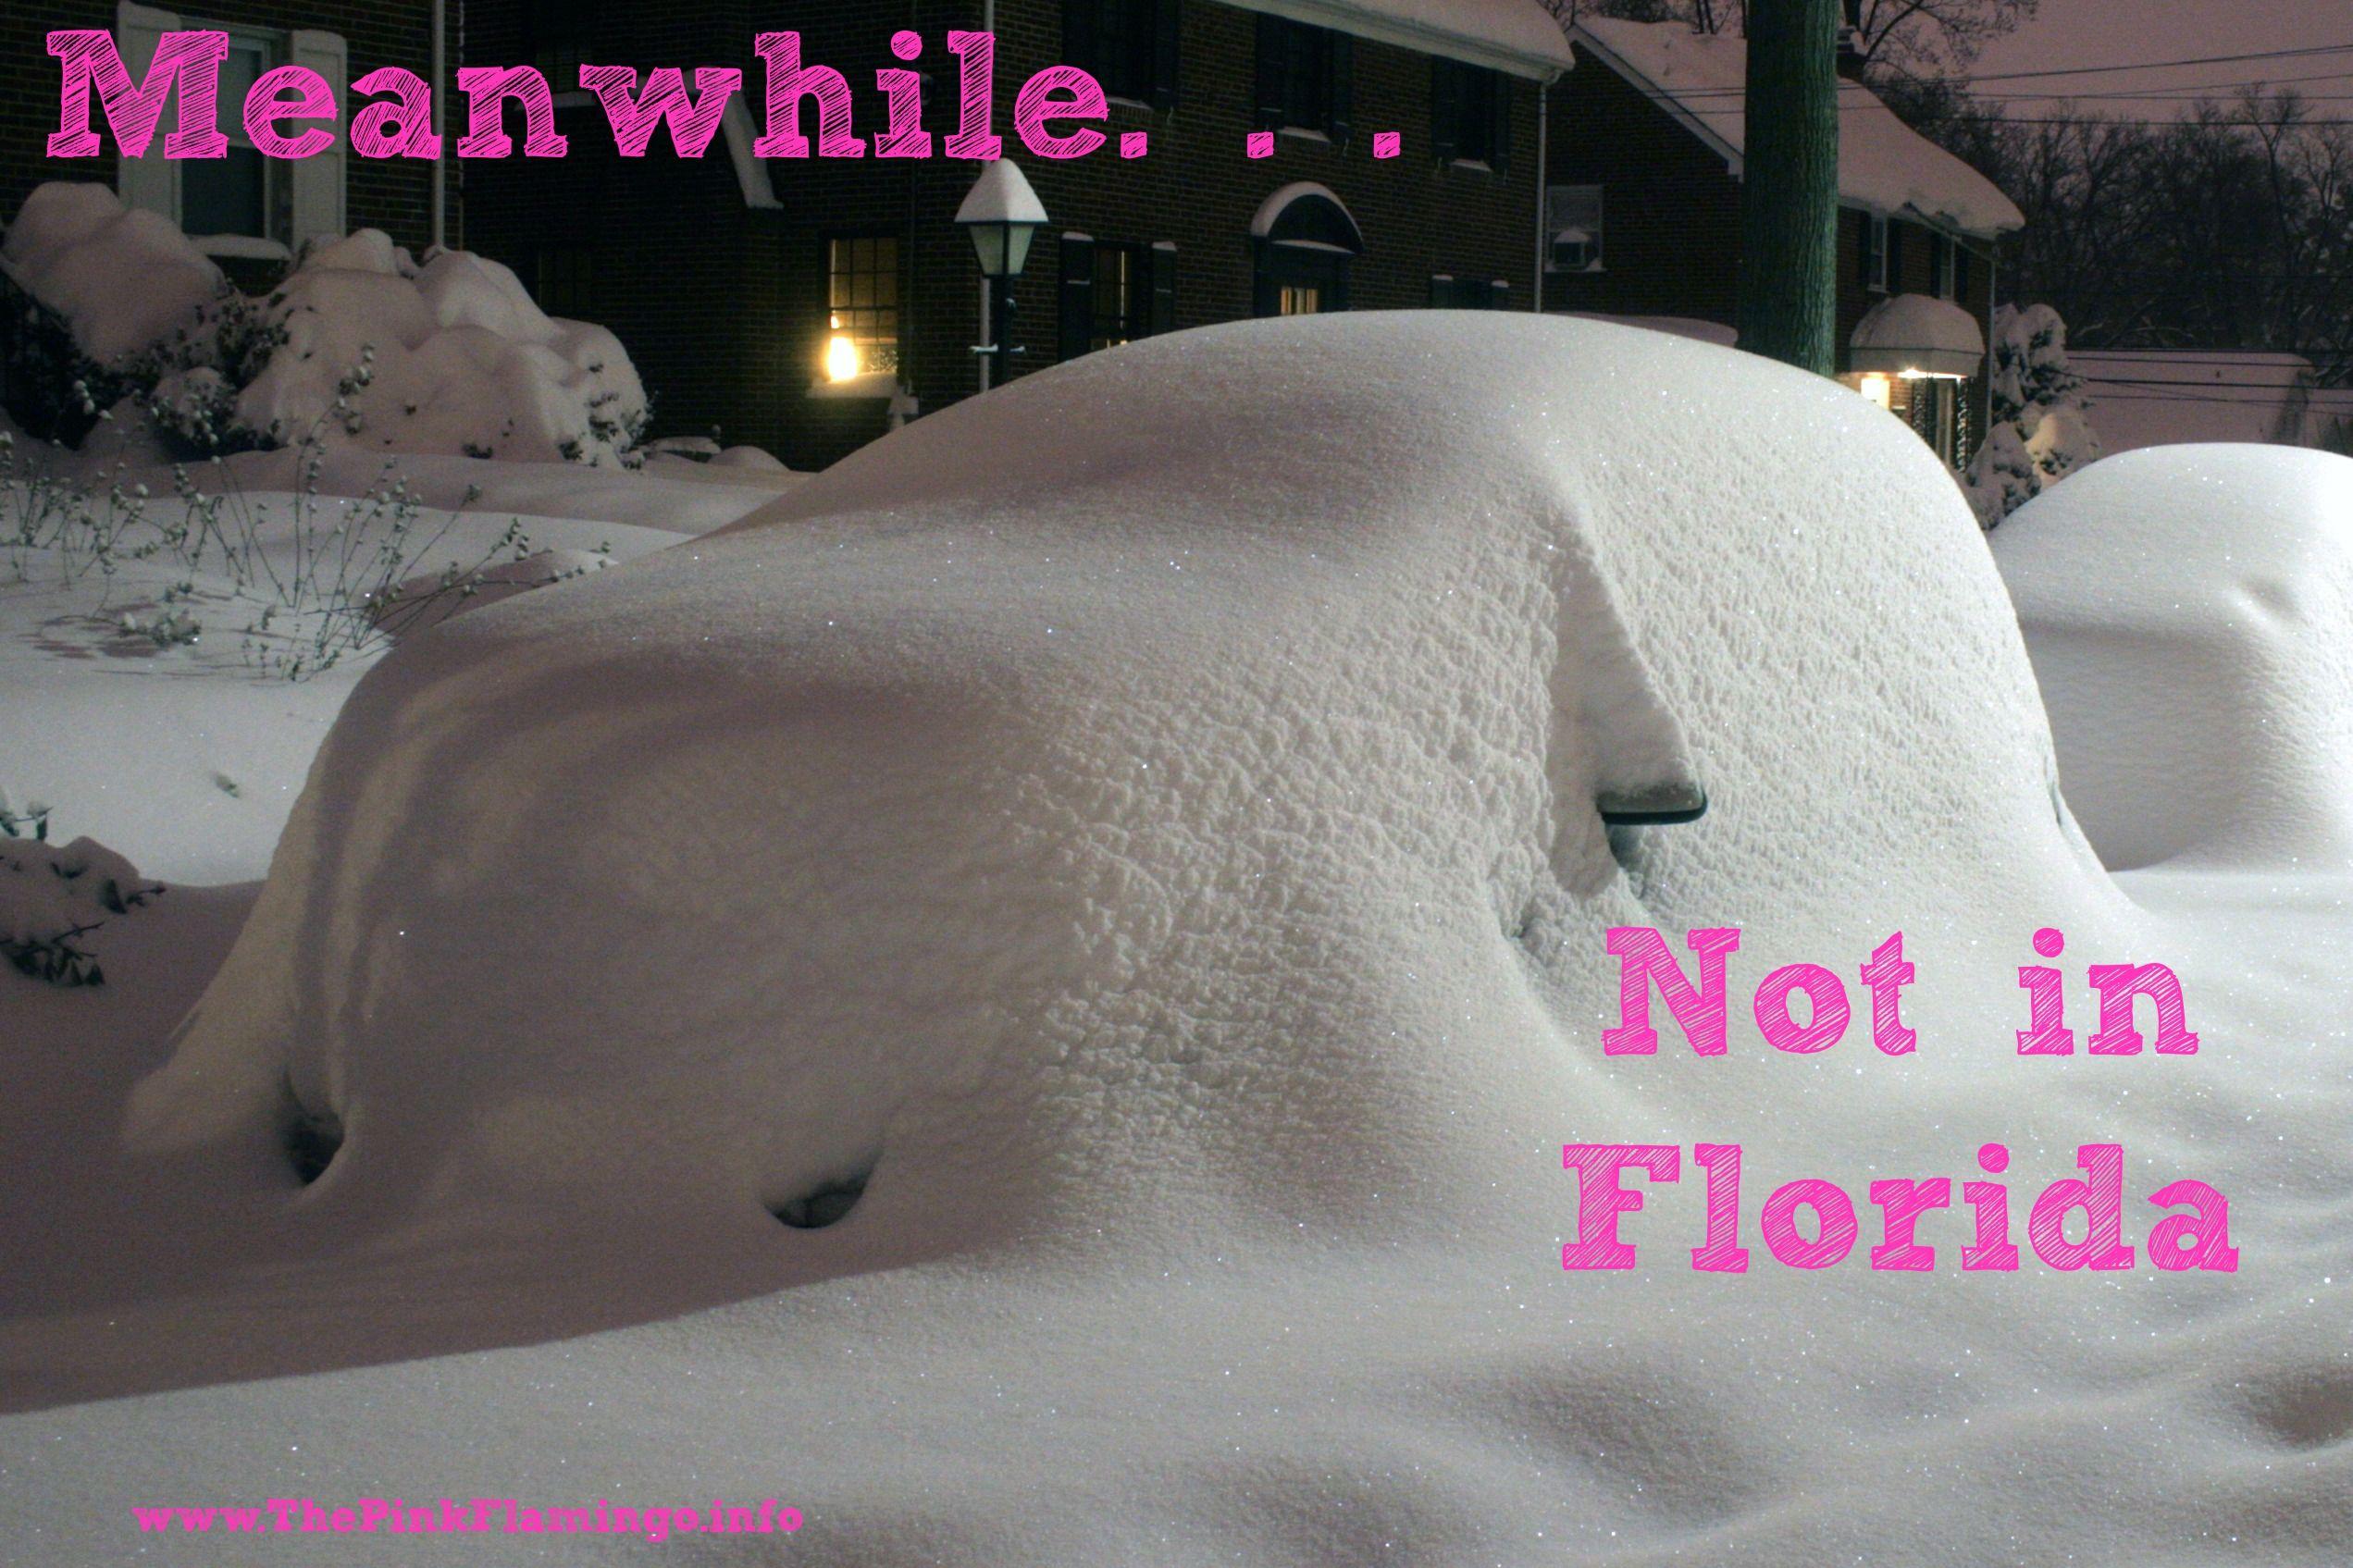 Not in florida notinflorida snowstorm snow snow